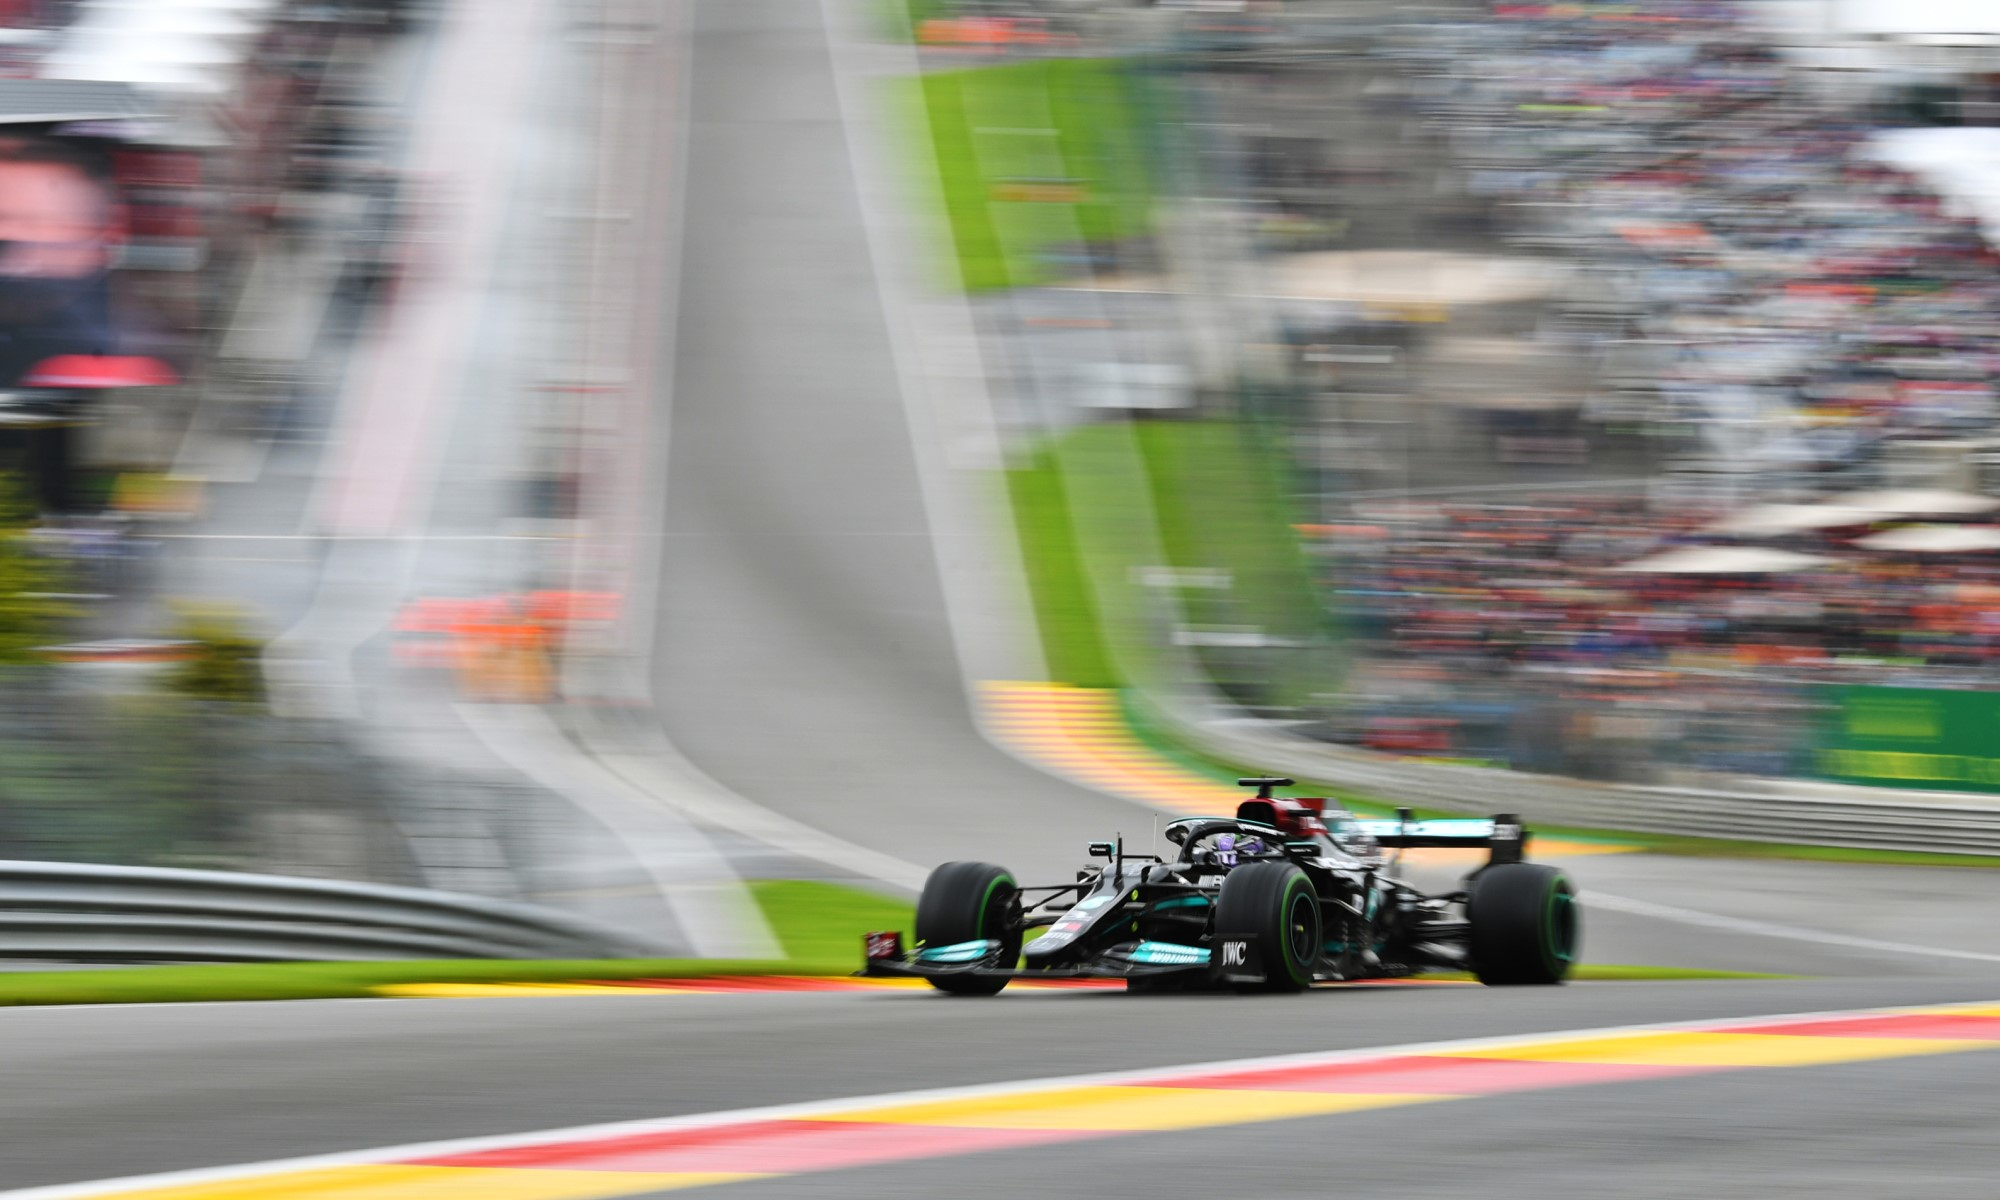 F1 Review Belgium 2021 (3)